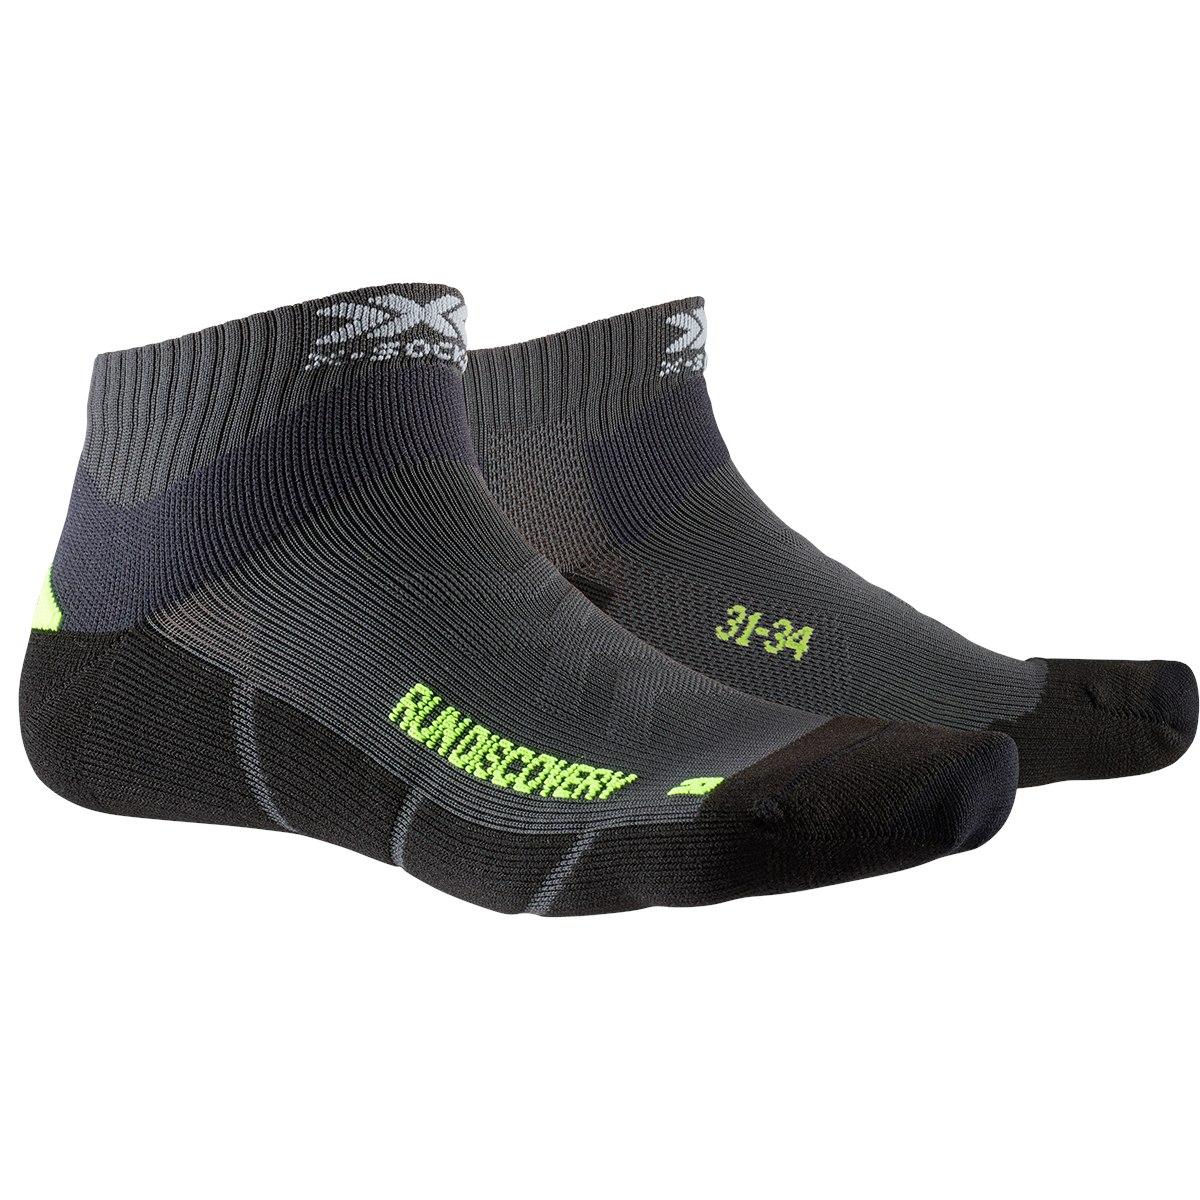 X-Socks Run Discovery Kinder Laufsocken - charcoal/phyton yellow/black